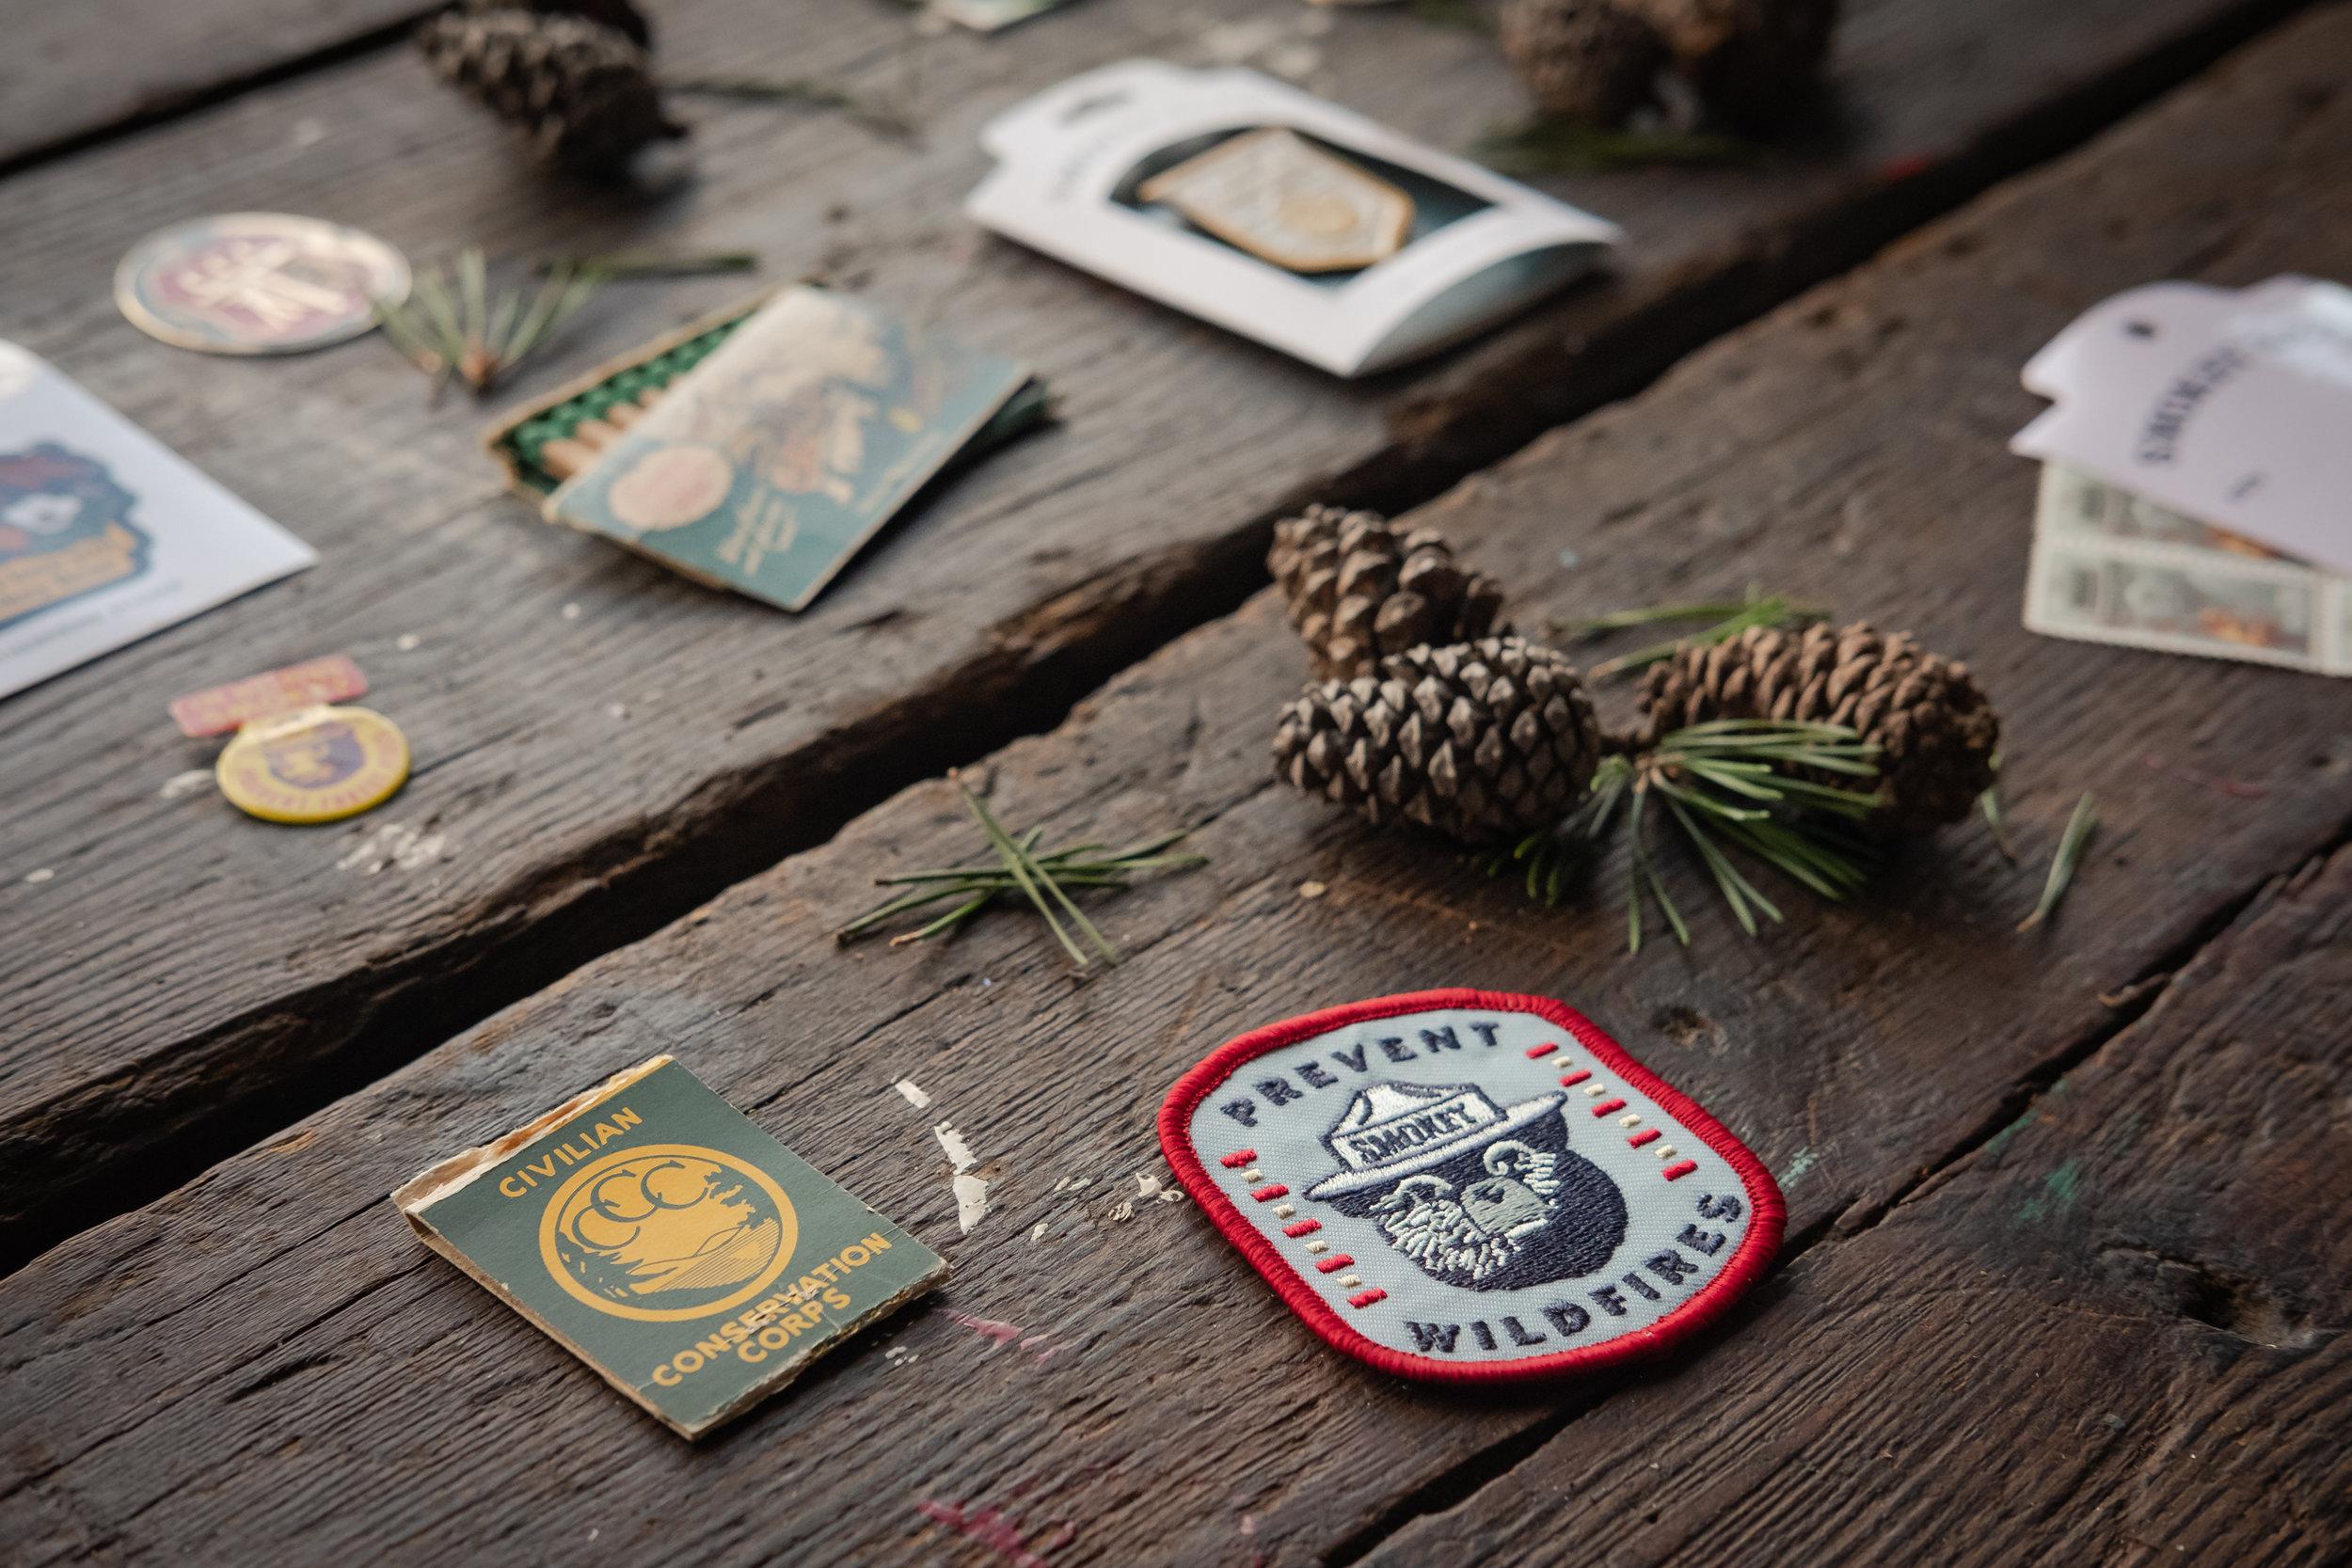 smokey-bear-patches-stickers-01.jpg